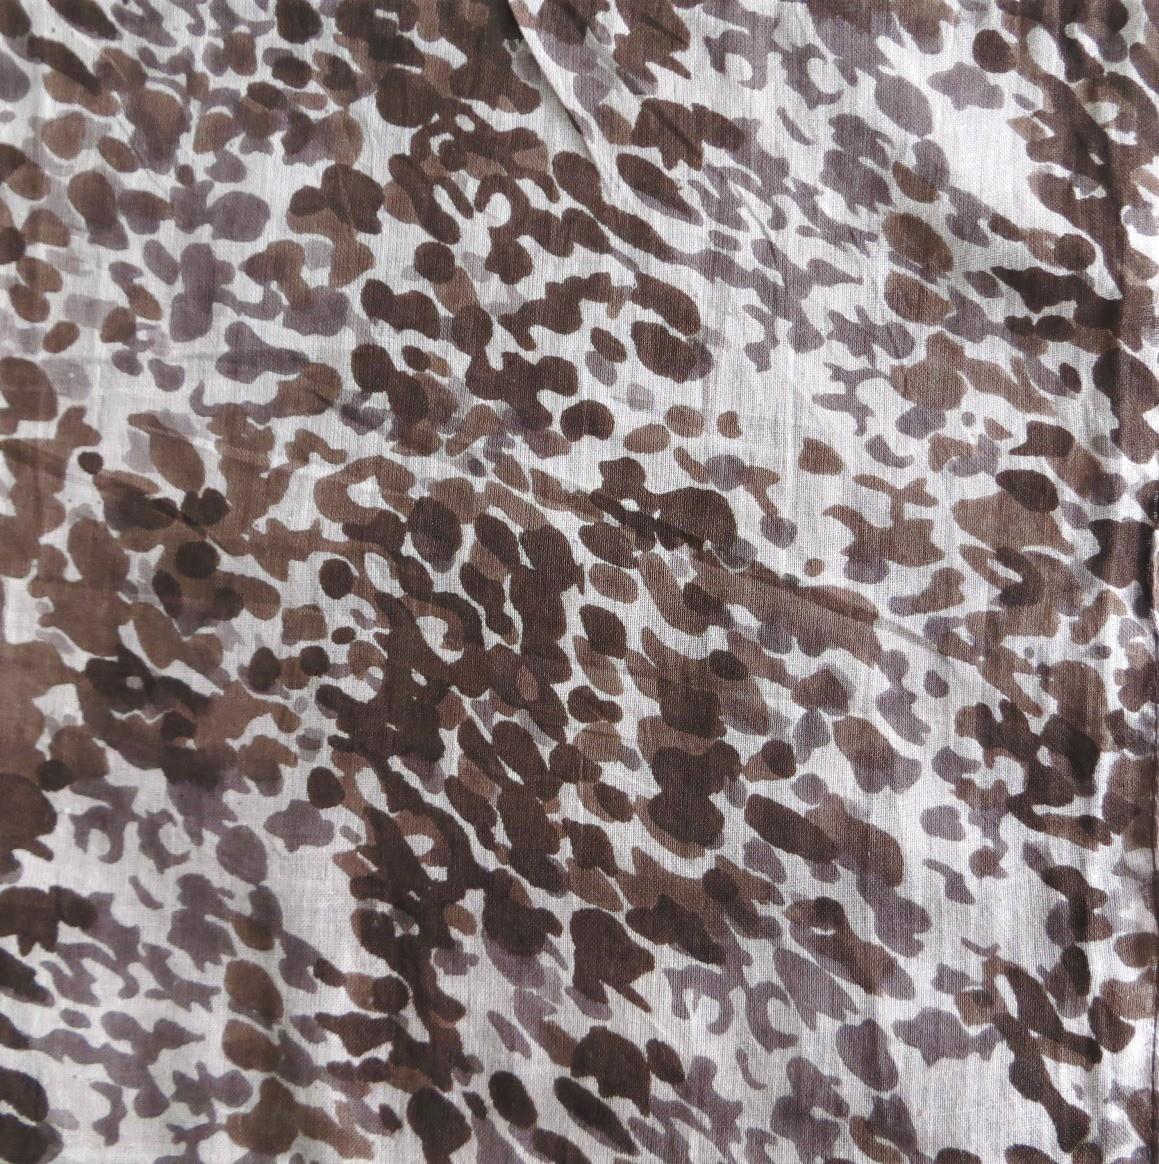 Brown & beige splatter print tichel